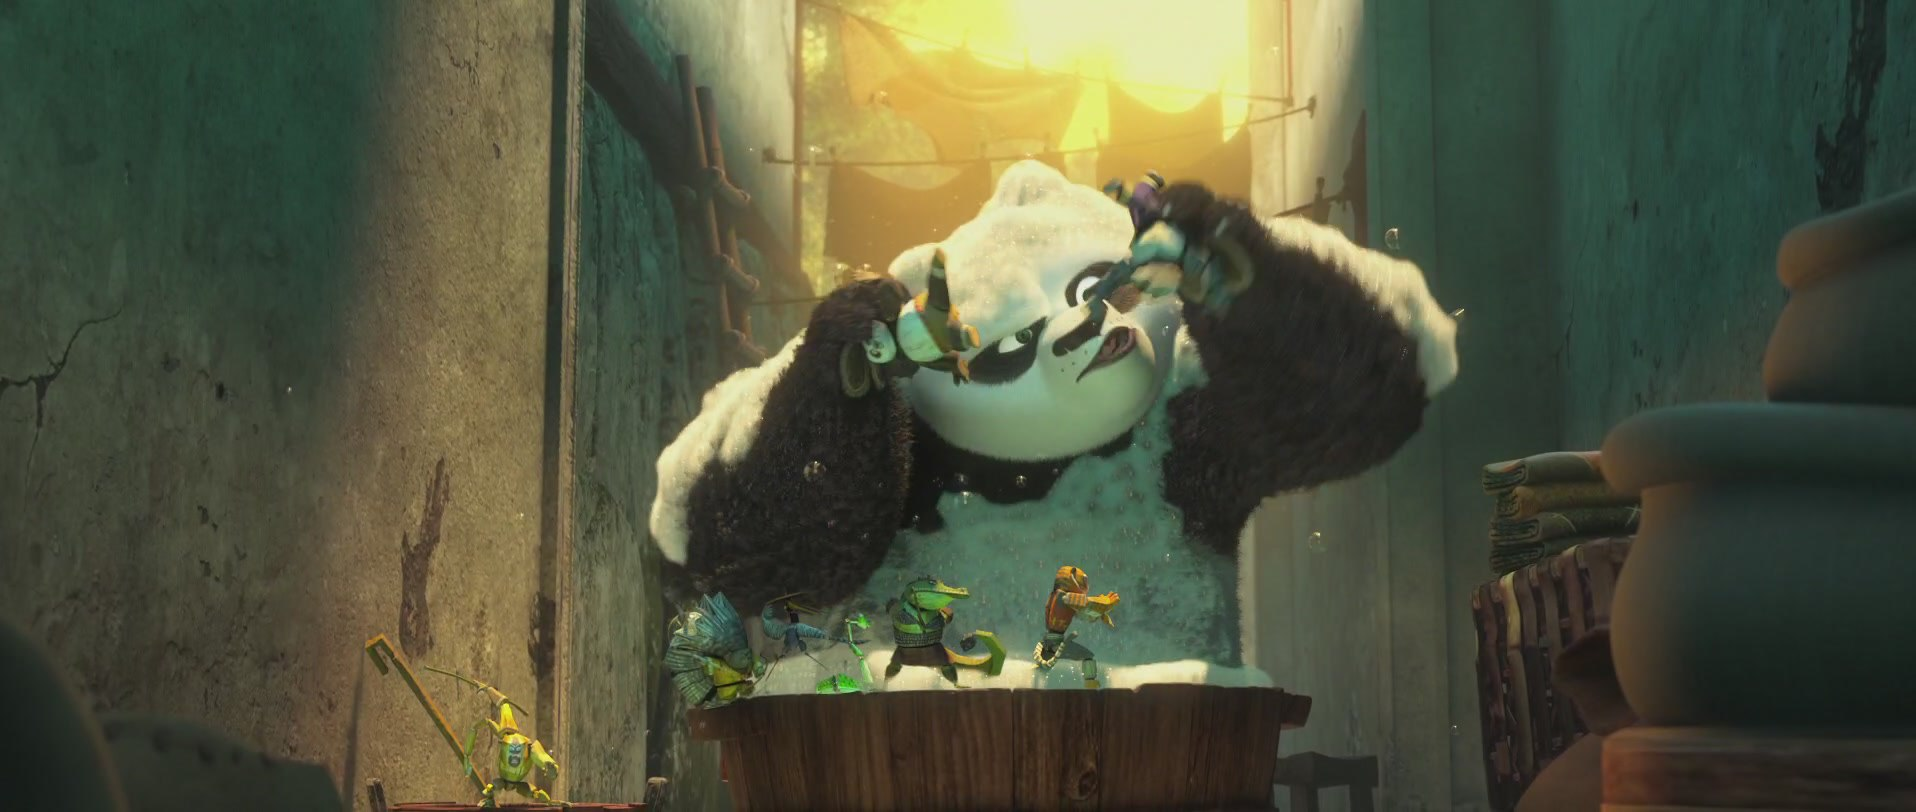 игры кунг-фу панды в душе 2016